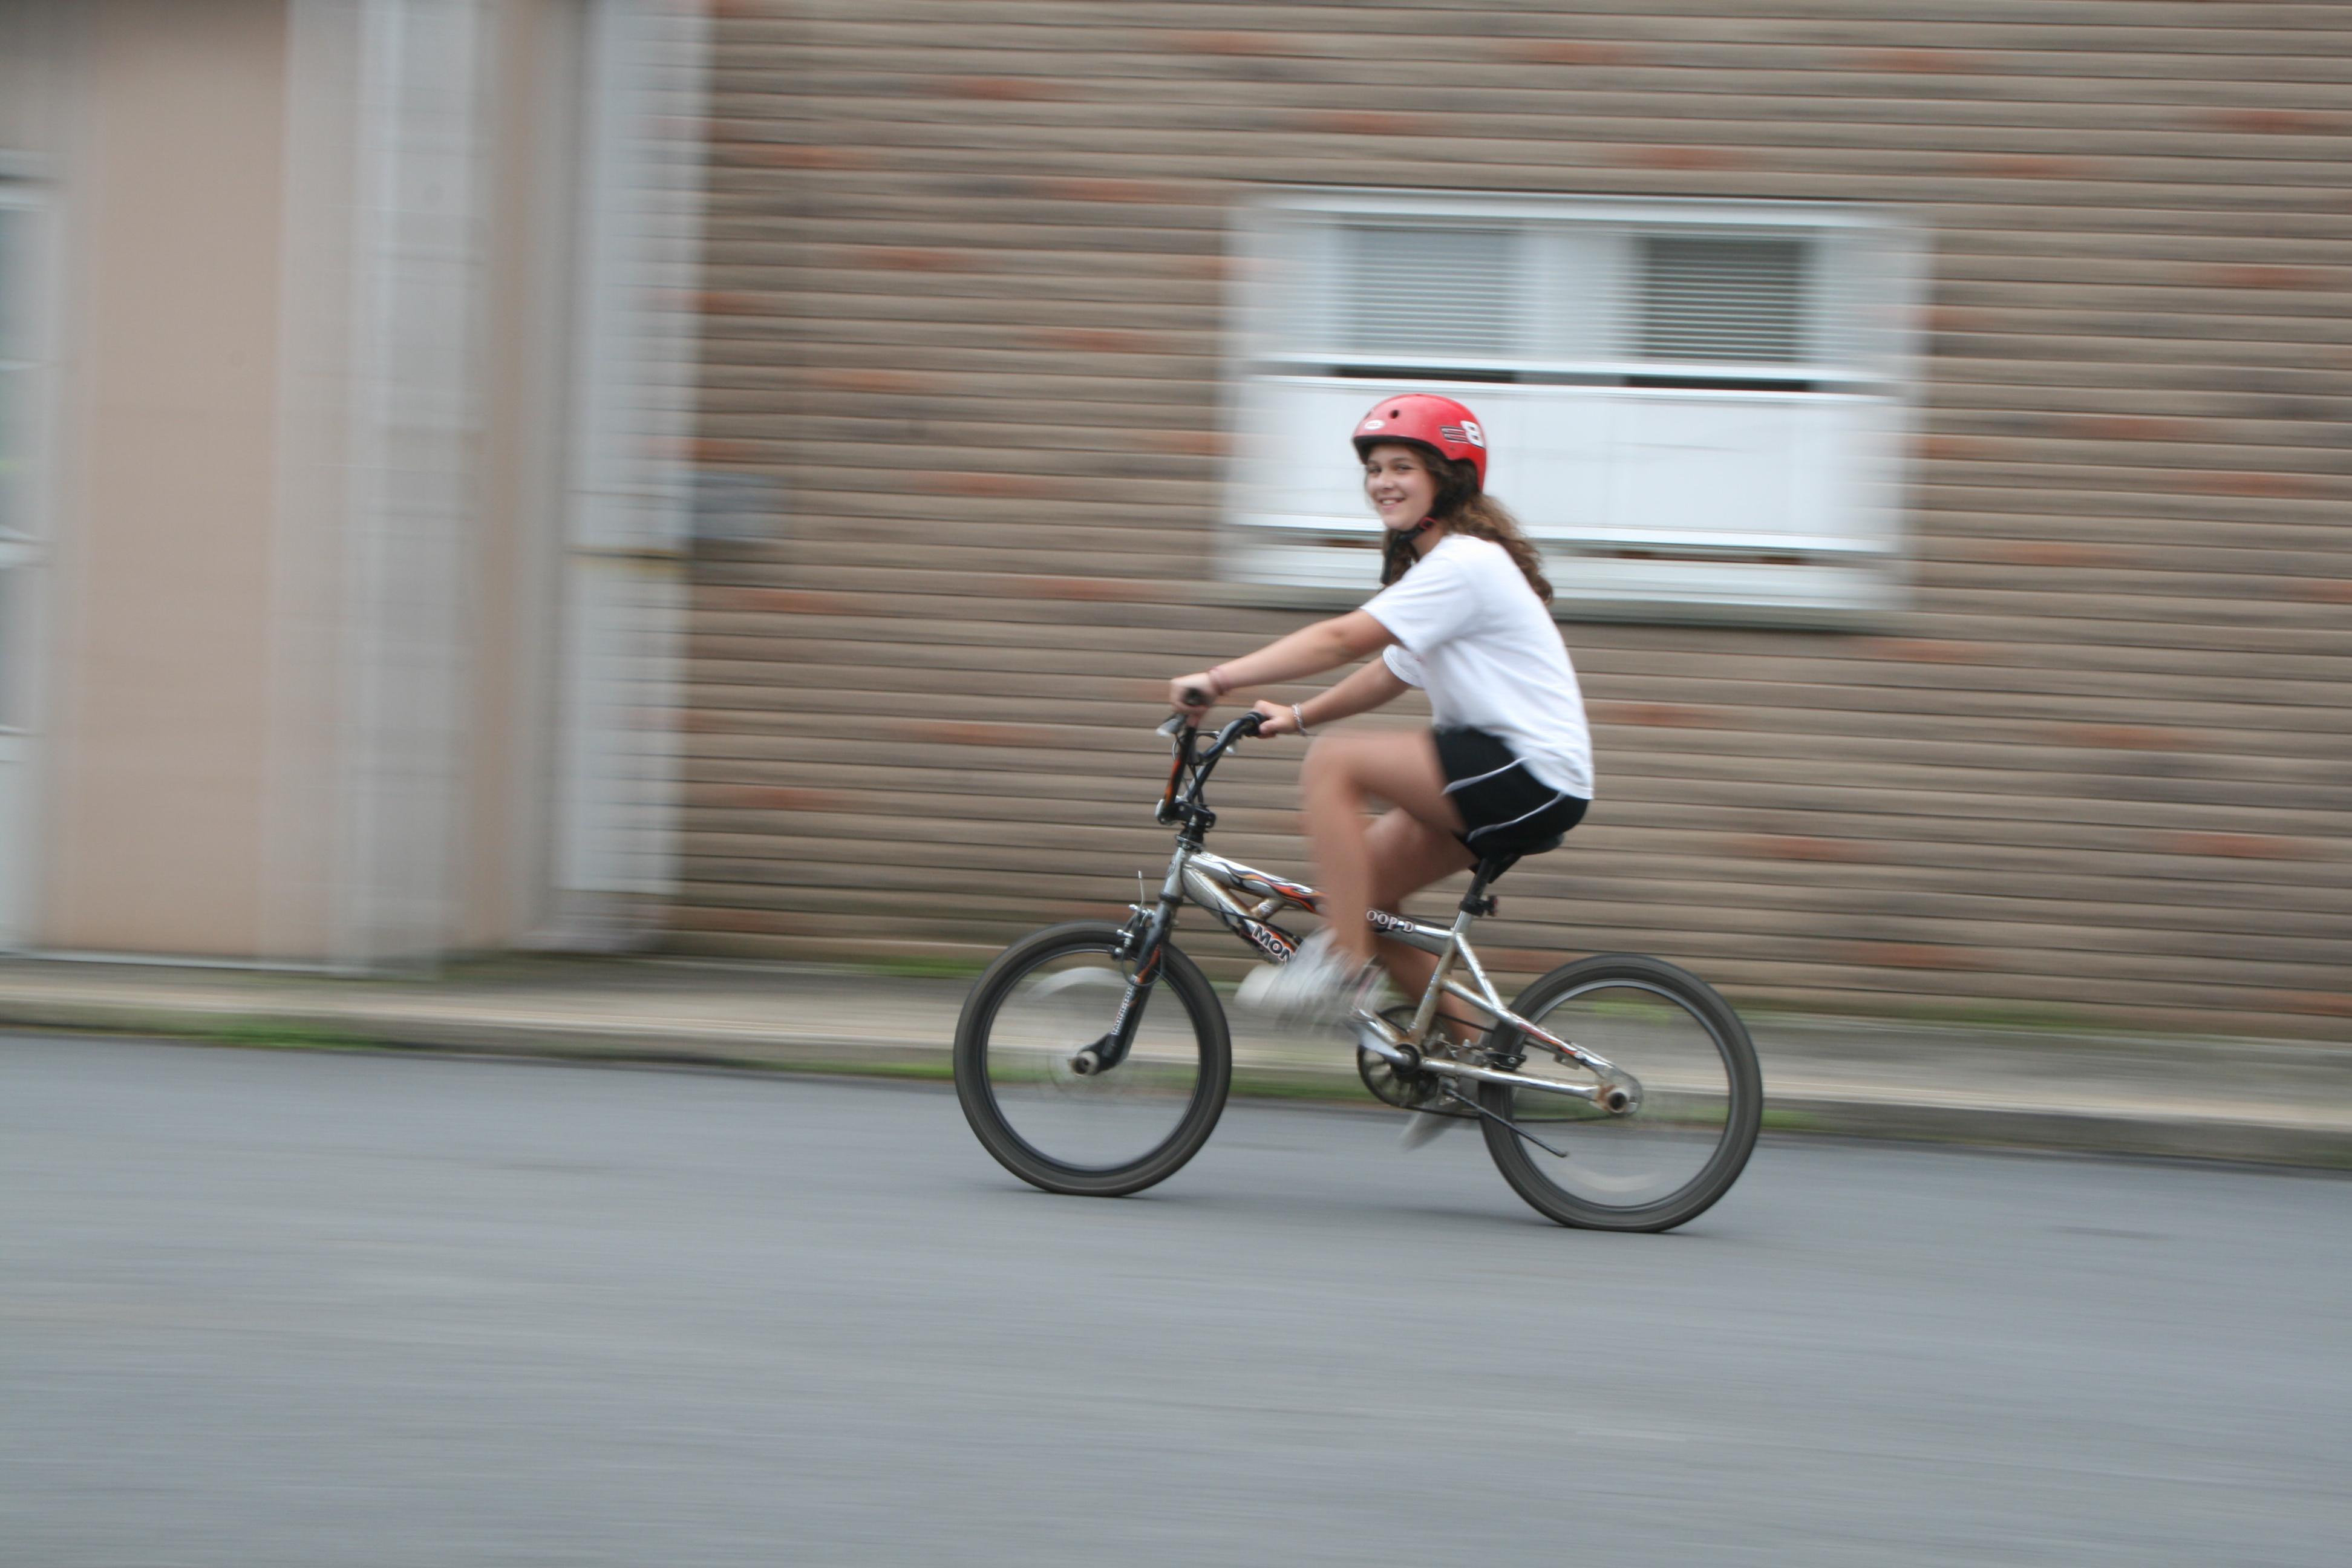 Bike Riding, Activity, Bicycle, Bike, Bmx, HQ Photo